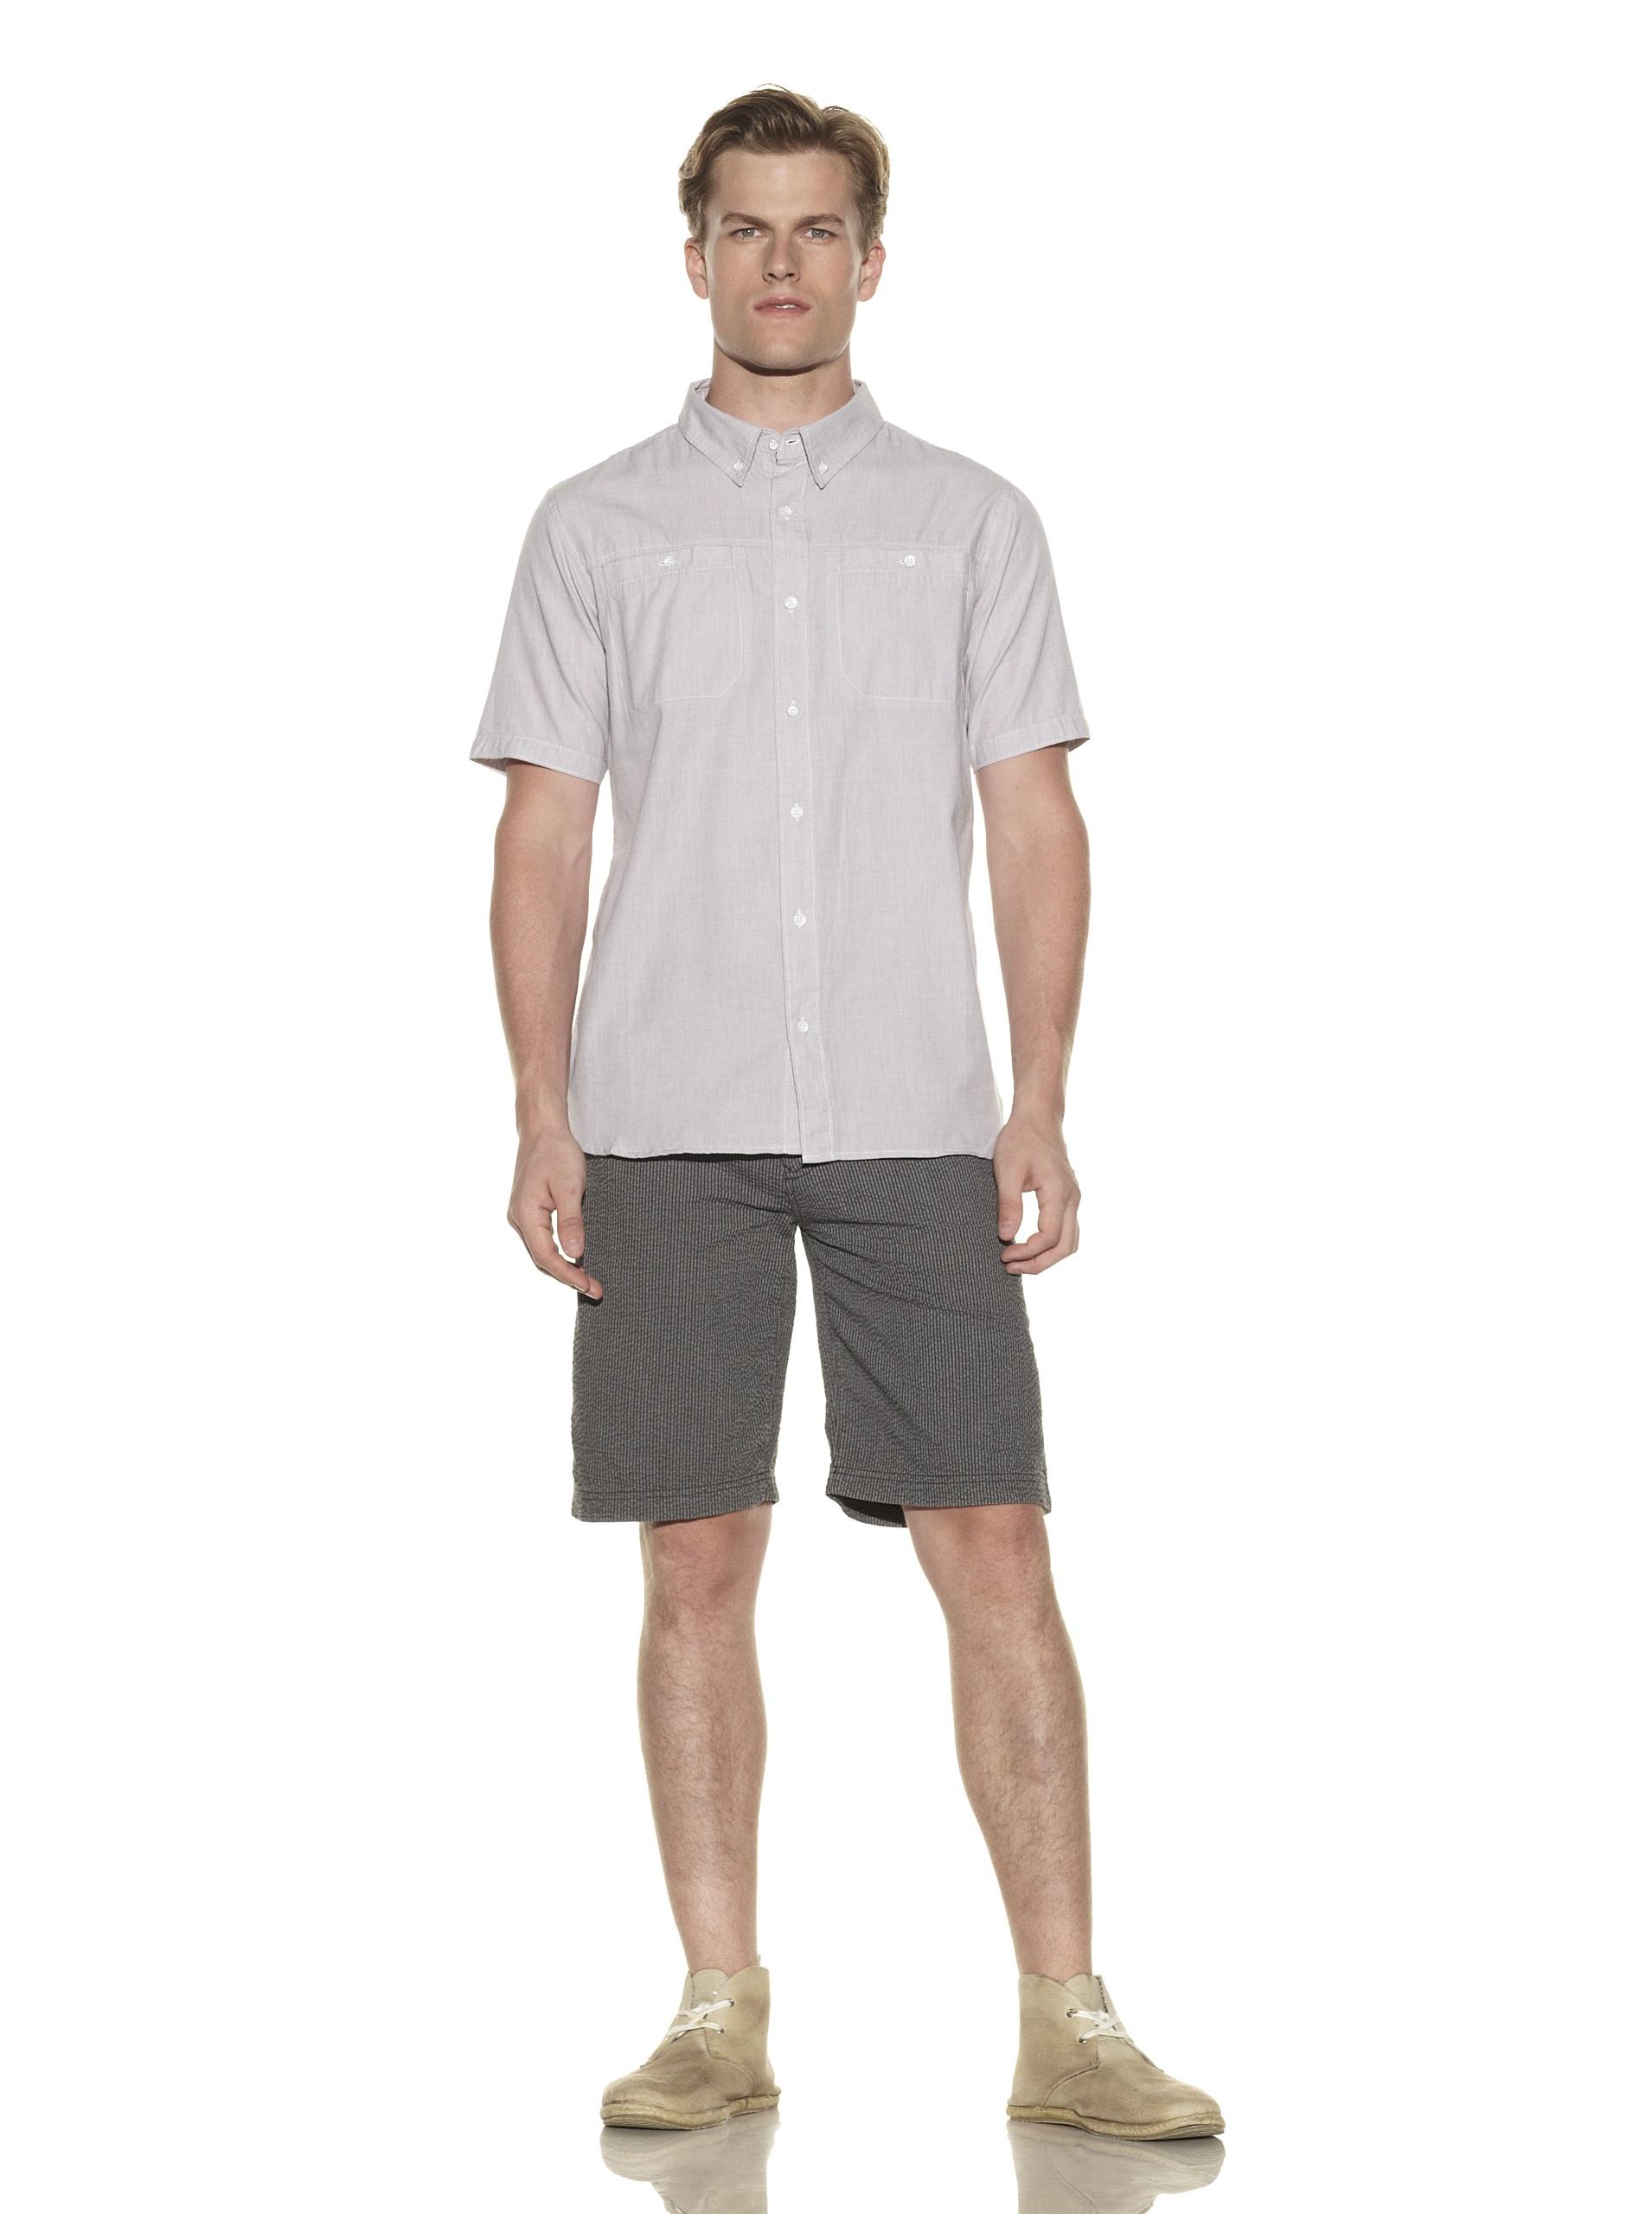 nüco Men's Short Sleeve Woven Chambray Shirt (Grey)